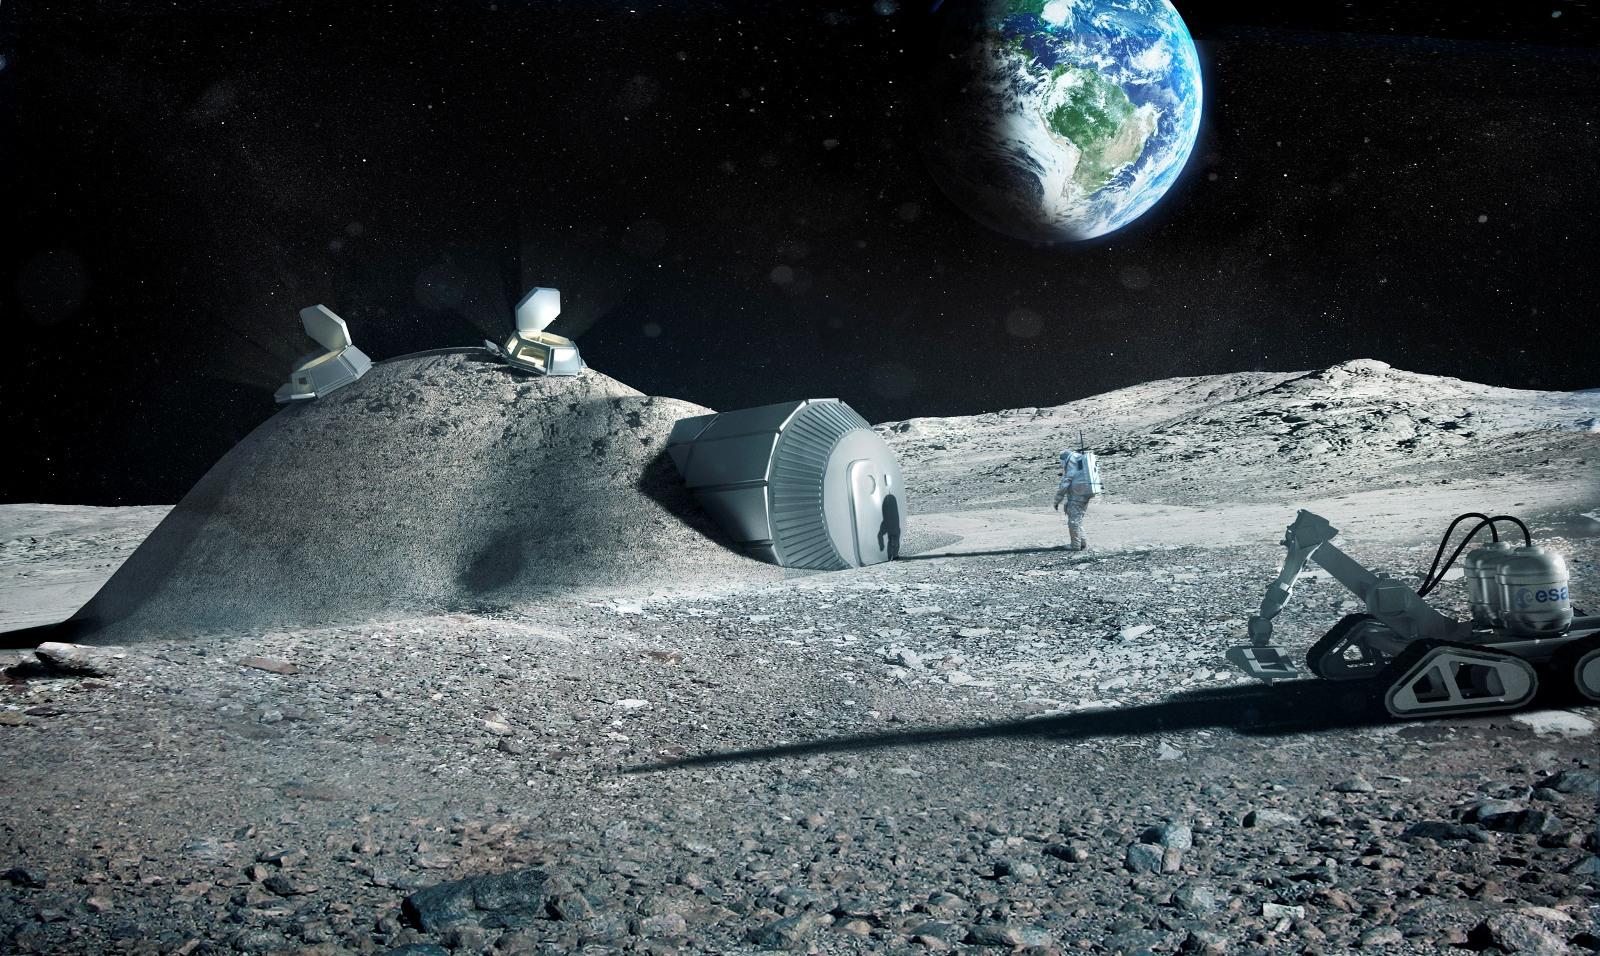 Lunar_base_made_with_3D_printing_ASF.jpg.33c46640c6f4e349608325937710ffcb.jpg